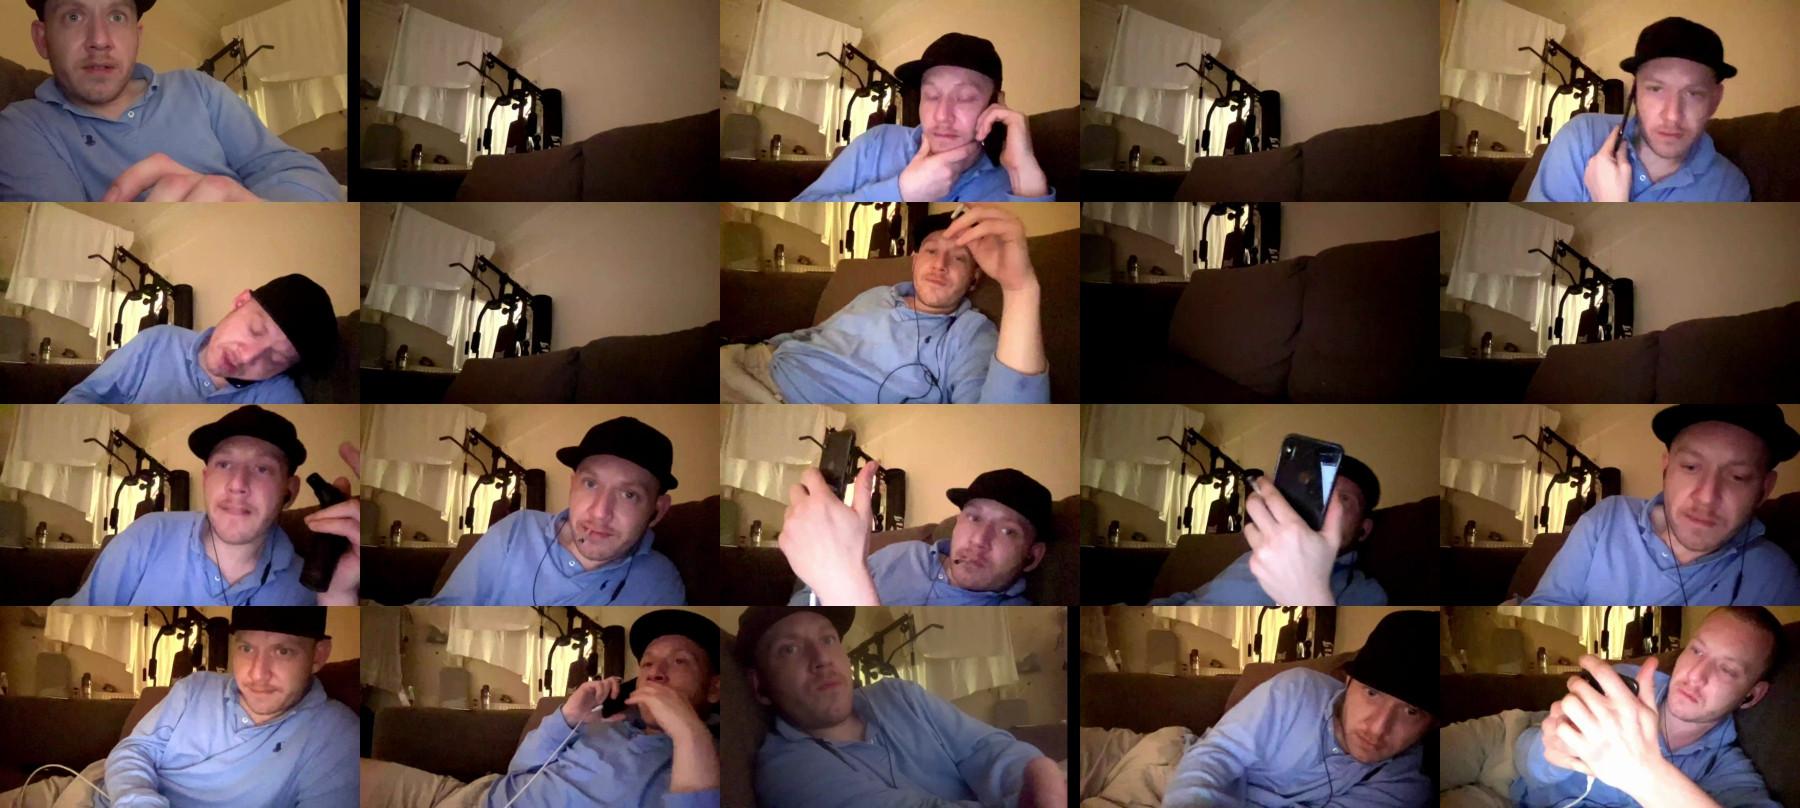 RICKYLONDON Cam4 14-05-2021 Recorded Video Naked